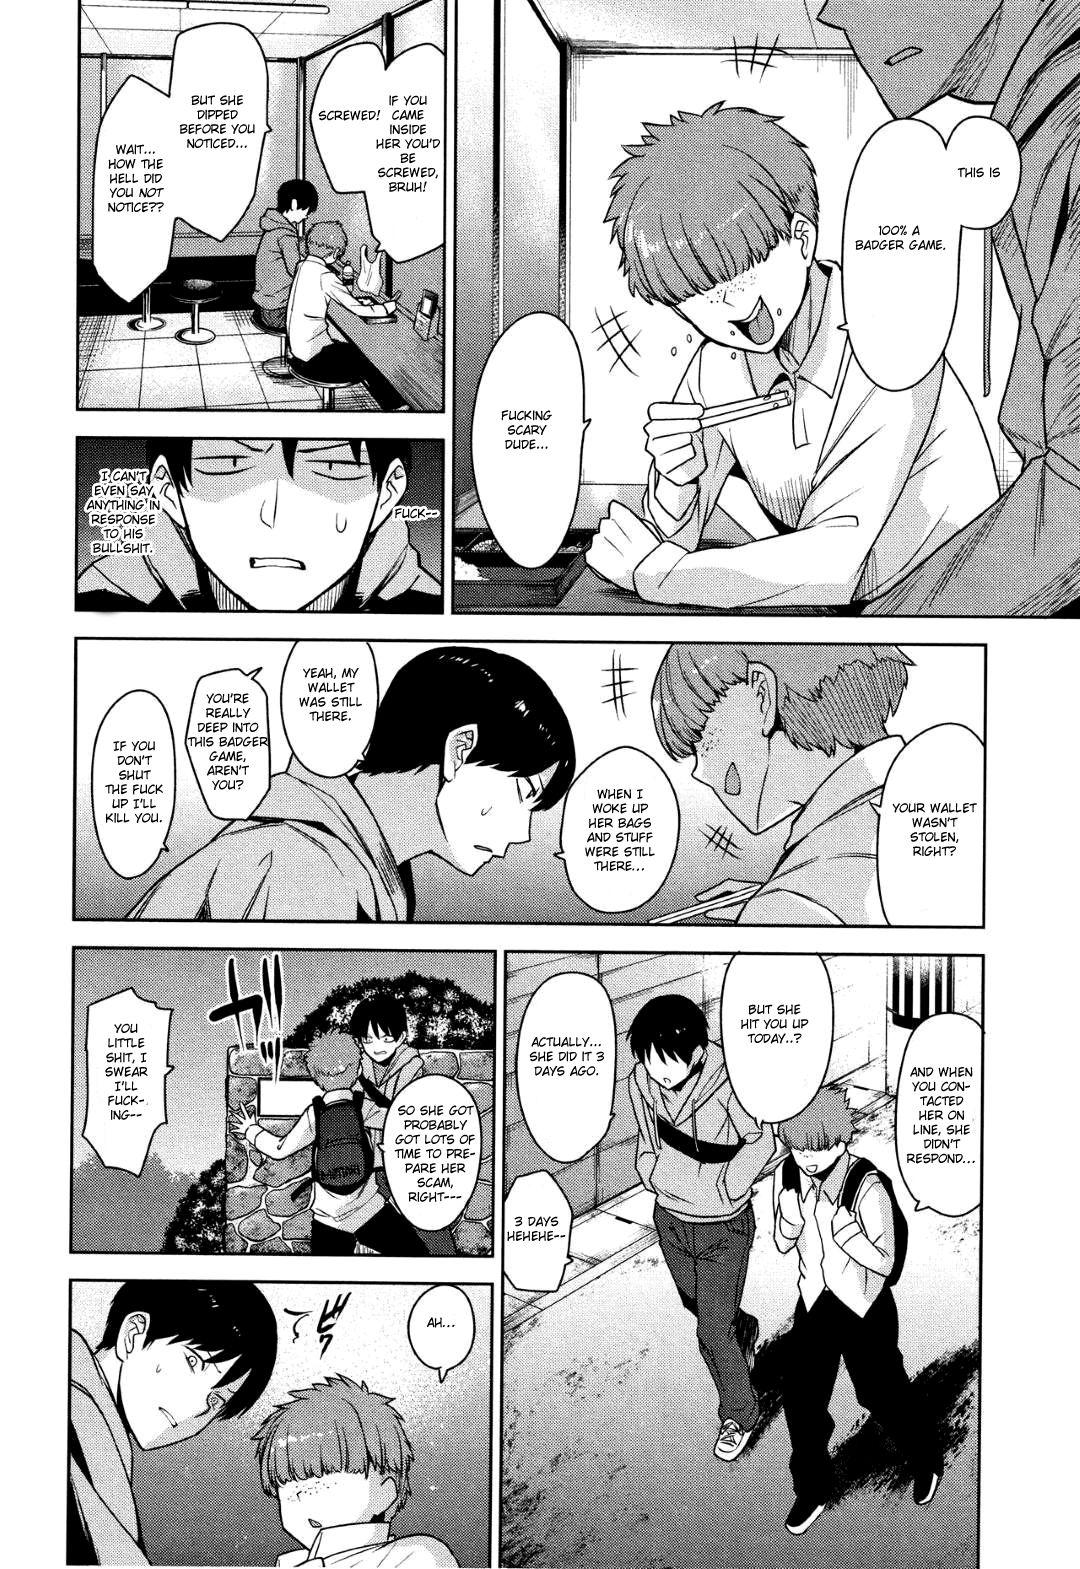 Kawaii Onnanoko o Tsuru Houhou - Method to catch a pretty girl Ch. 2 21